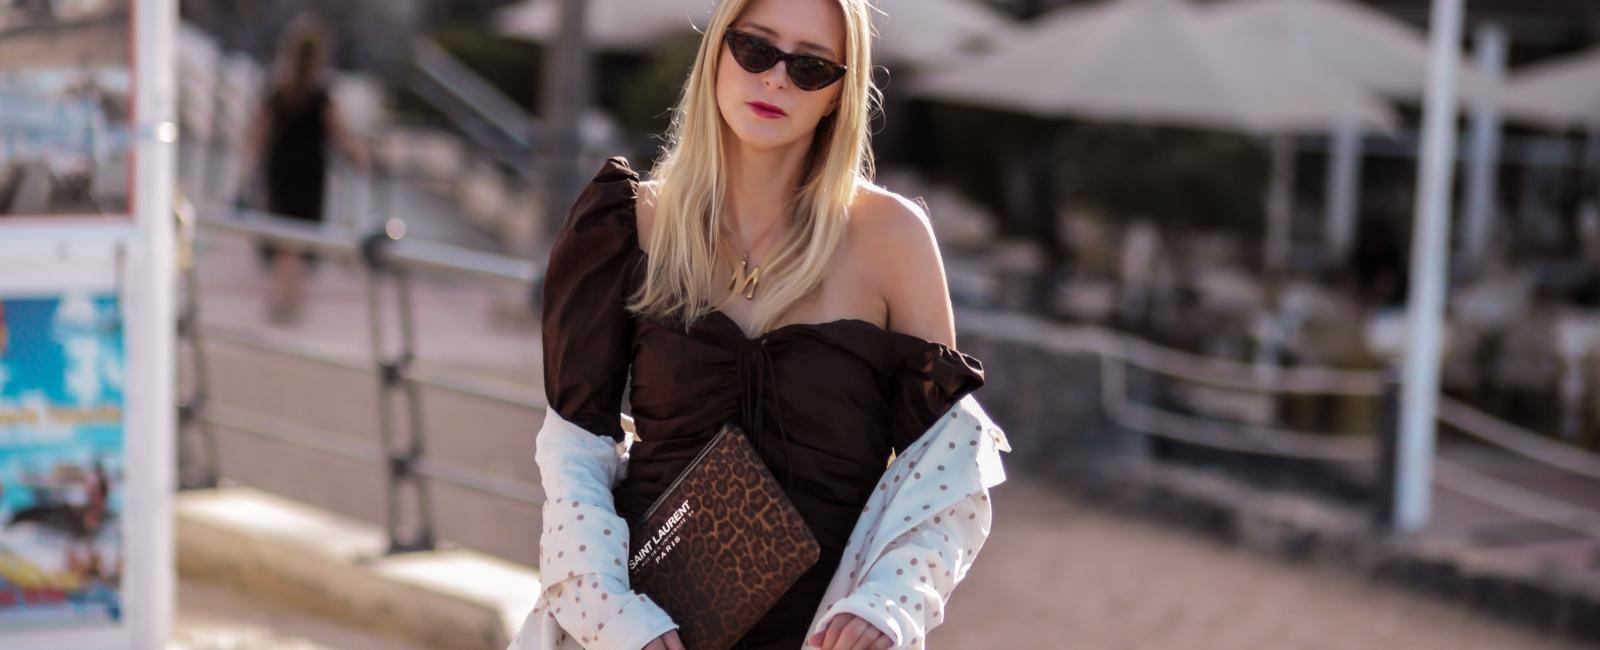 MOD-by-Monique-Fashion-Looks-LPA-Polka-Dots-Blazer-Meets-Leopard-9